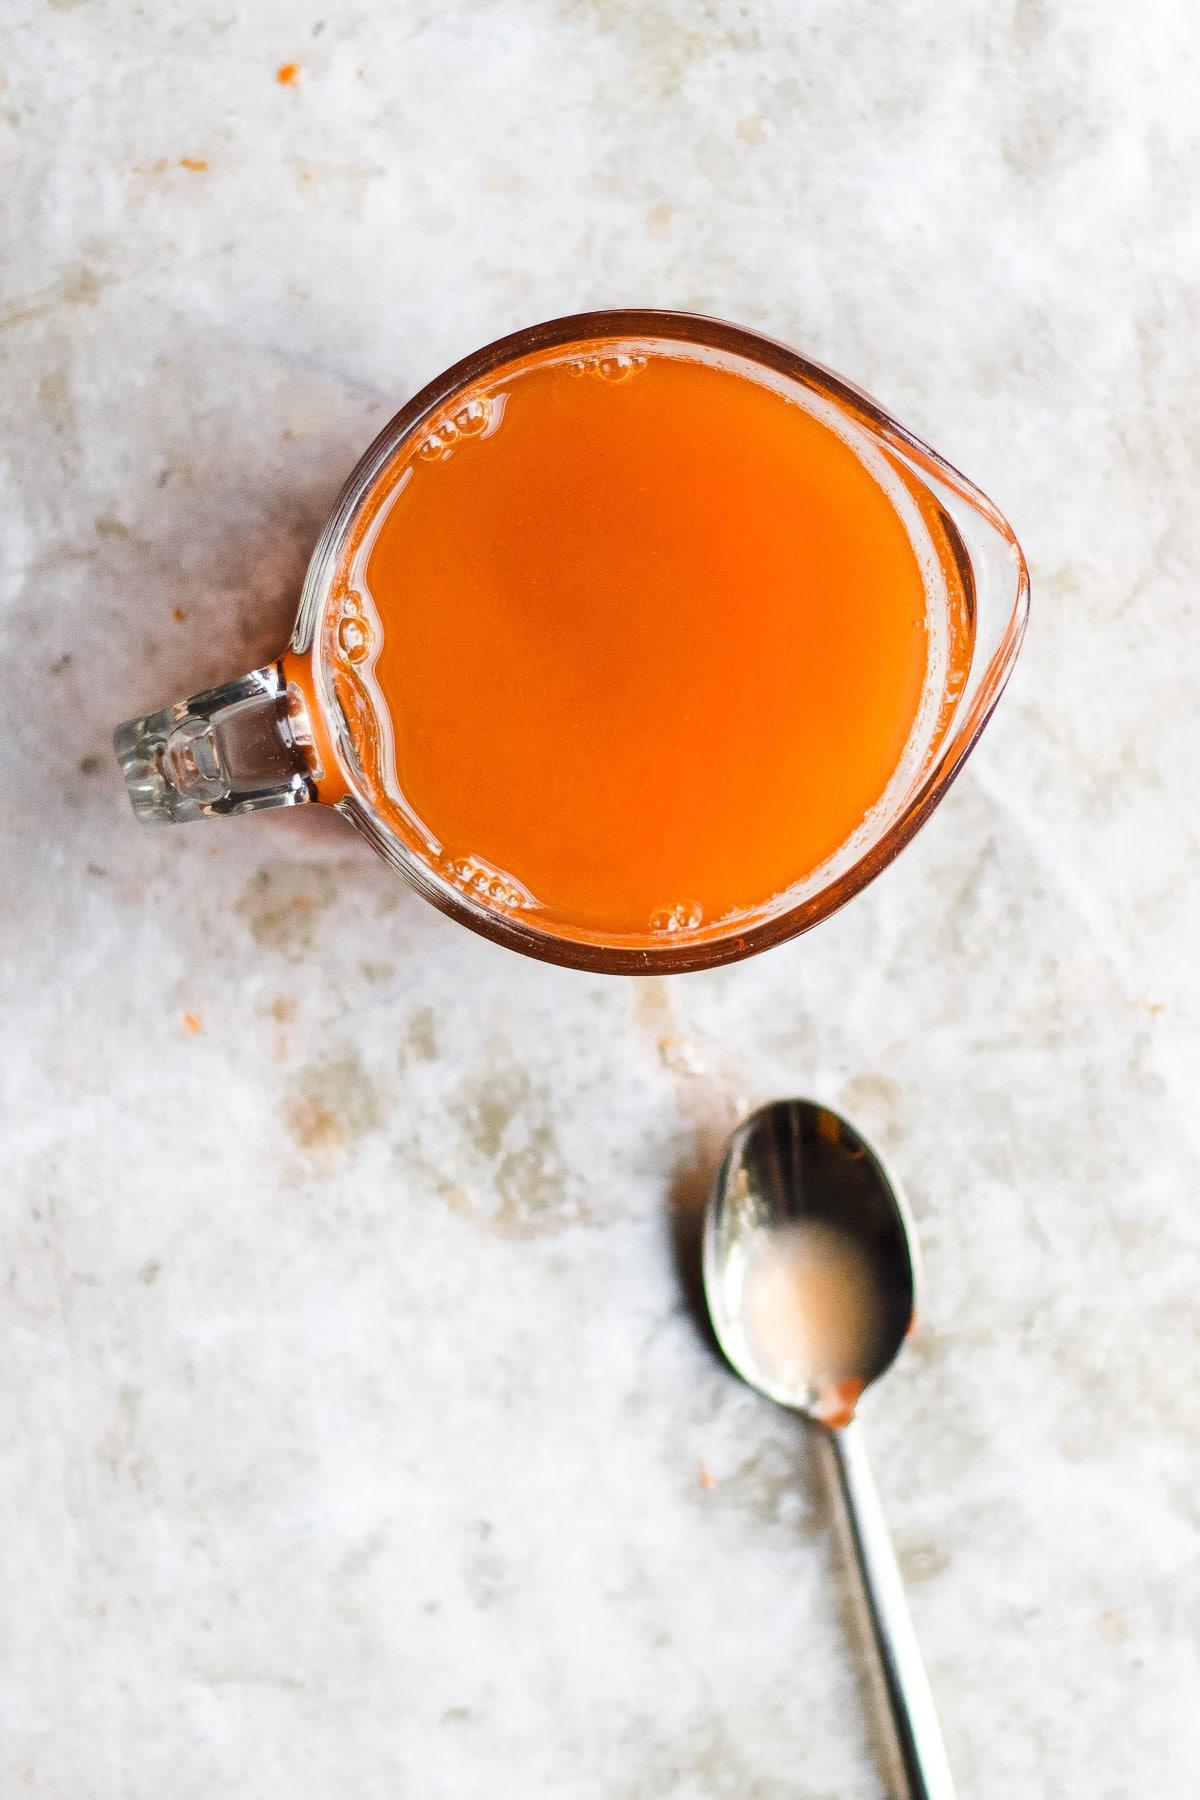 carrot shrub cocktail mix